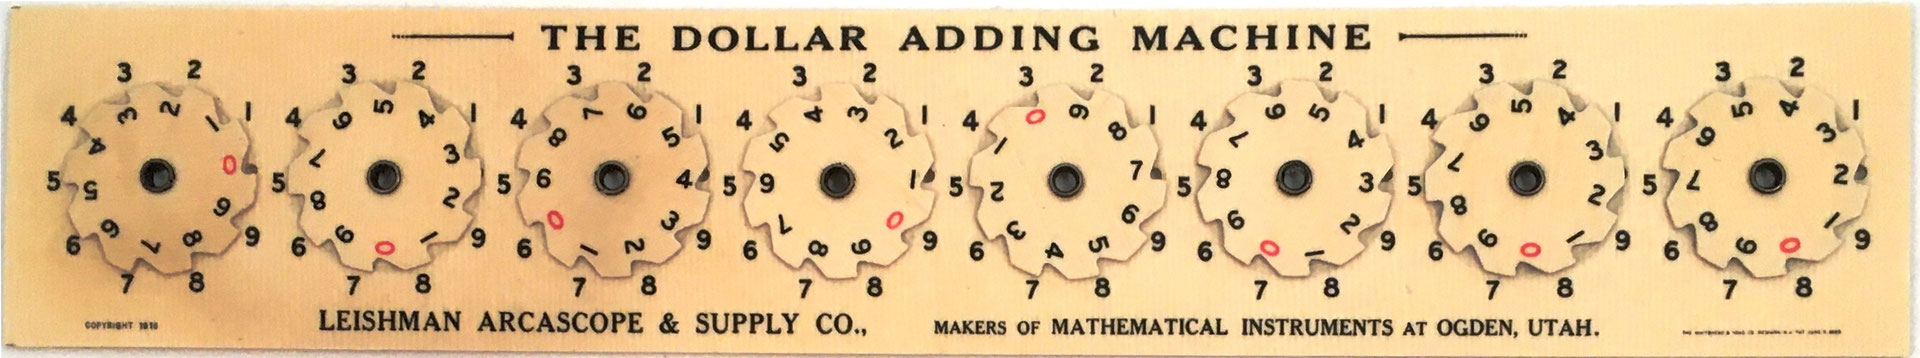 The Dollar Adding Machine, variante de Little Marvel Adders, fabricado por Leishman Arcascope & Supply Co, año 1916, 24x4.5 cm